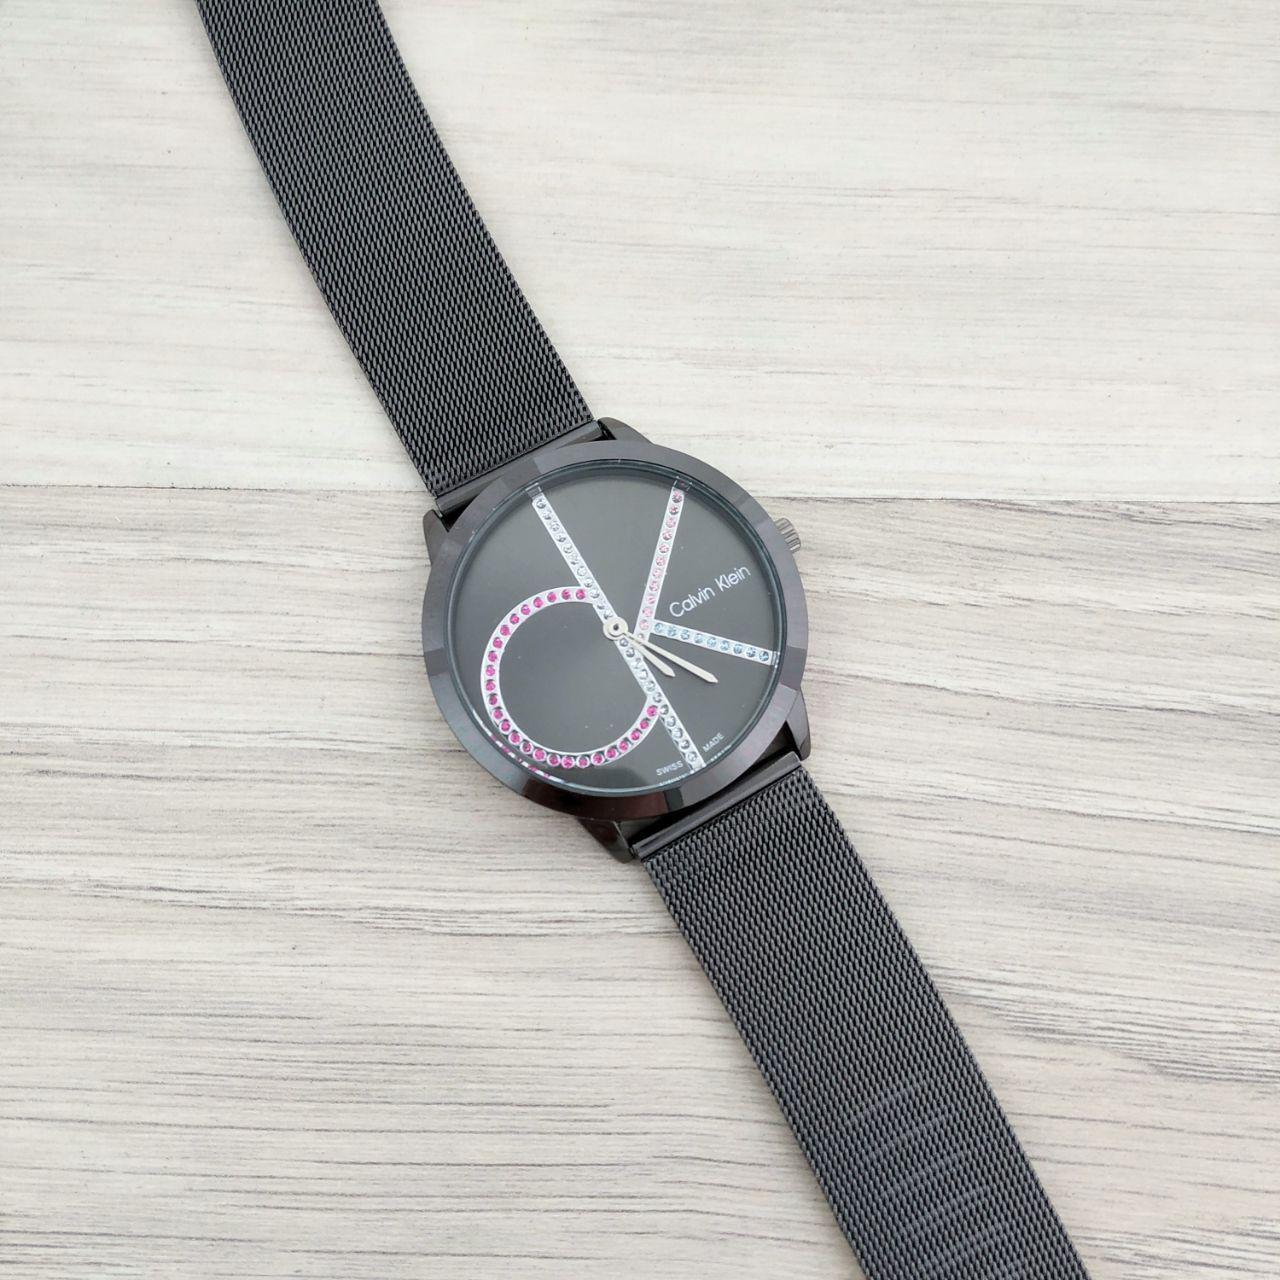 fcdedfcef3048 Наручные мужские часы Calvin Klein 1004-0342: продажа, цена в ...